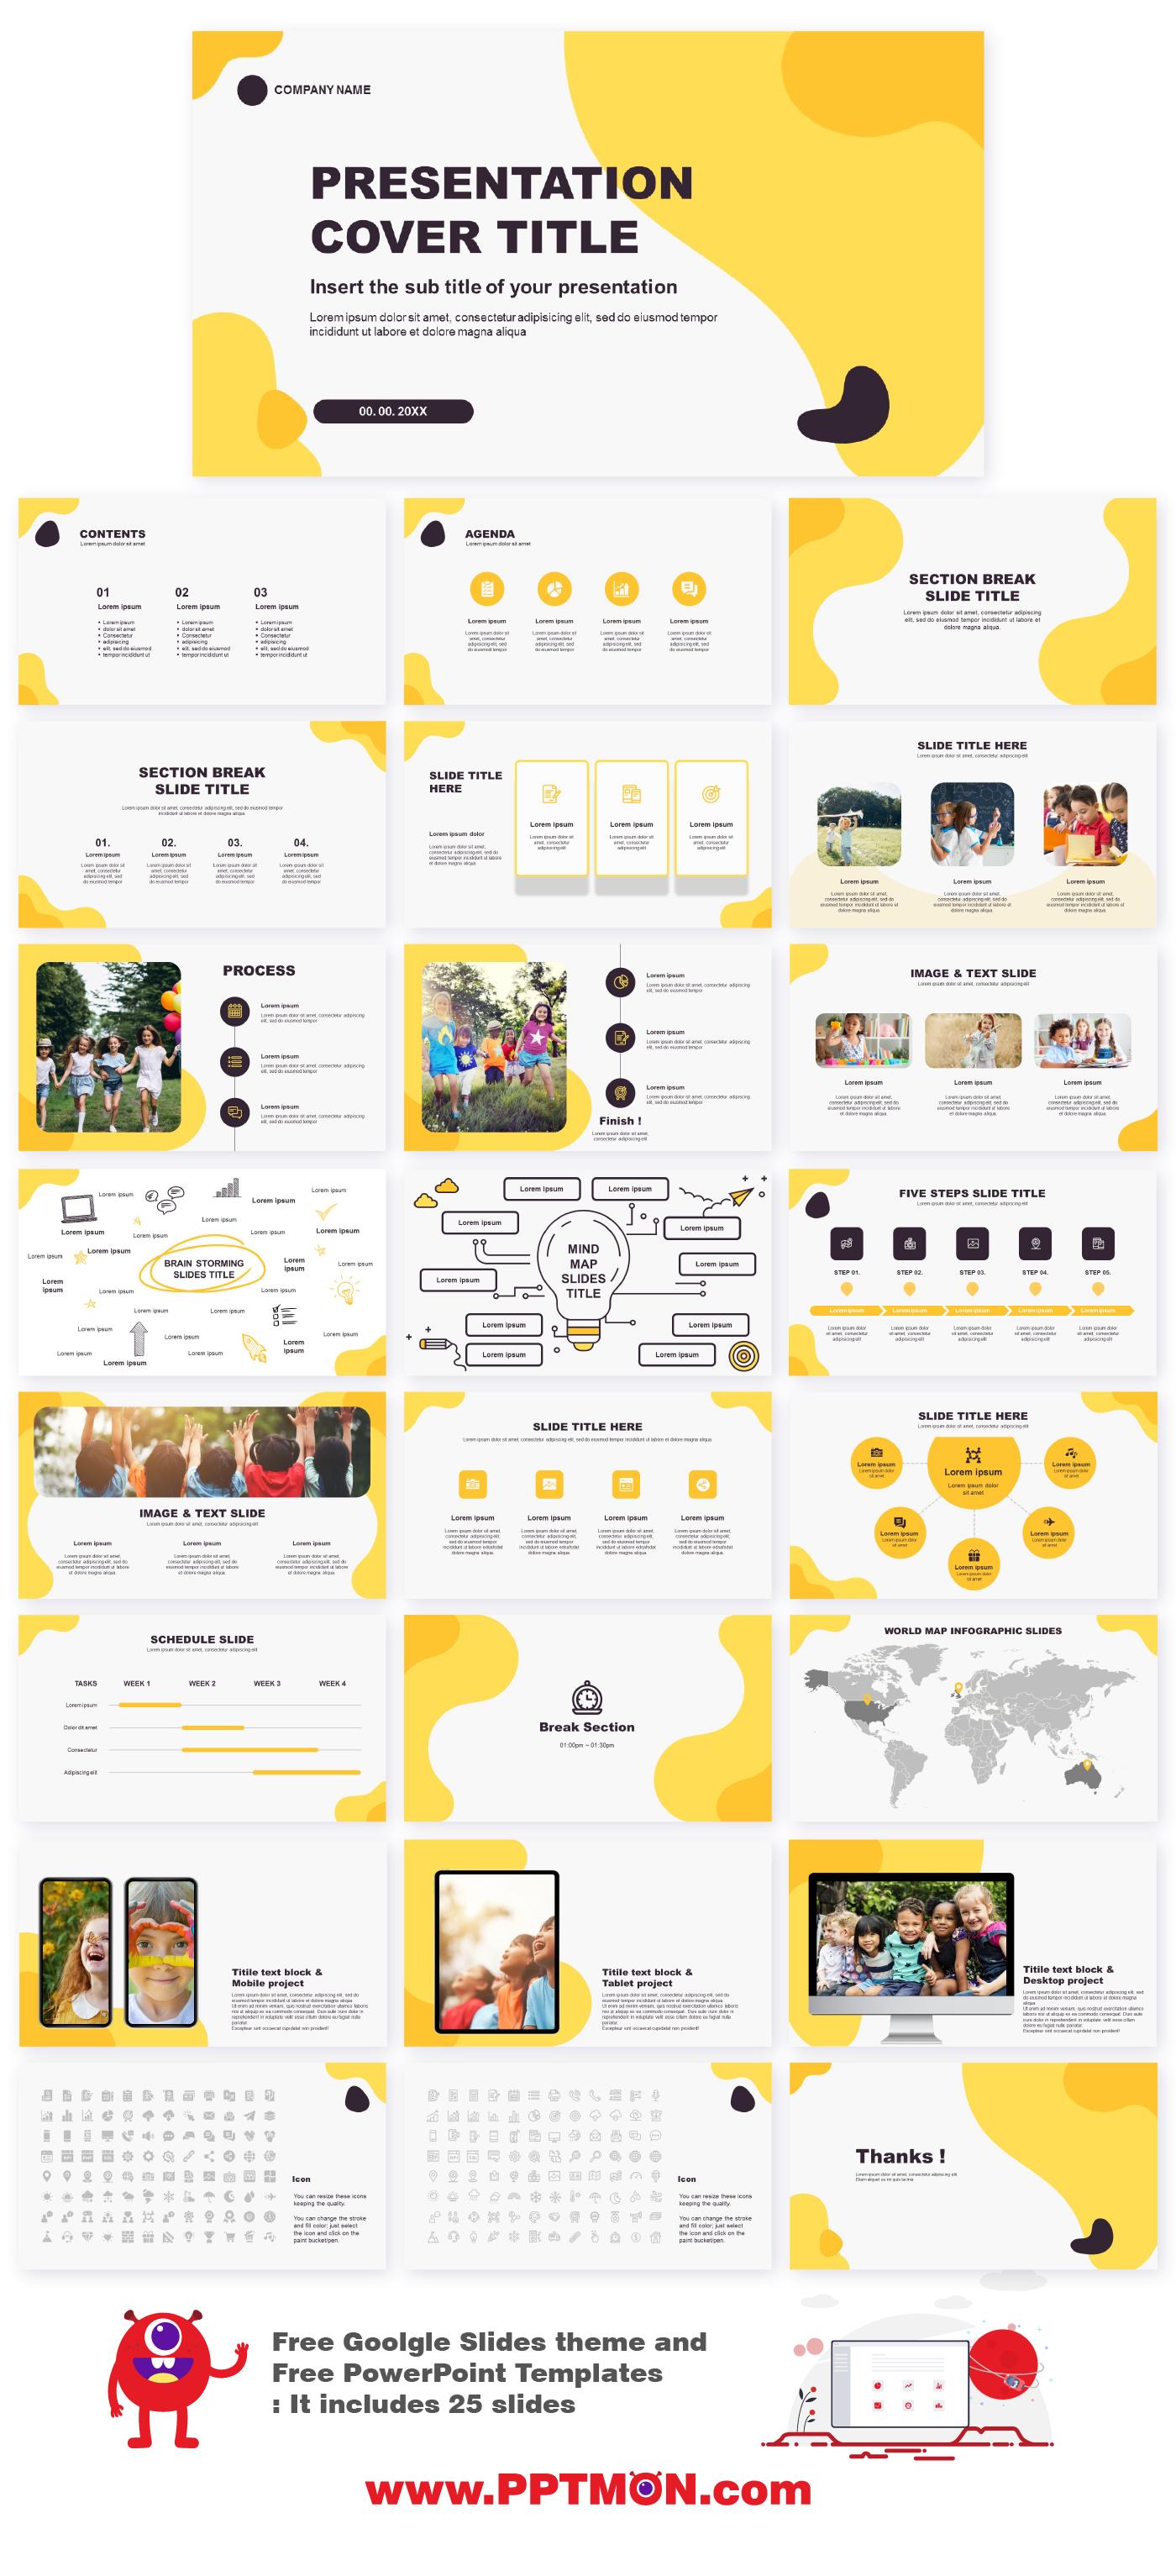 Wave Abstract Free Powerpoint Templates And Google Slides Theme By Pptmon Com ออกแบบเว บ การออกแบบโบรช วร เค าโครงการนำเสนอ